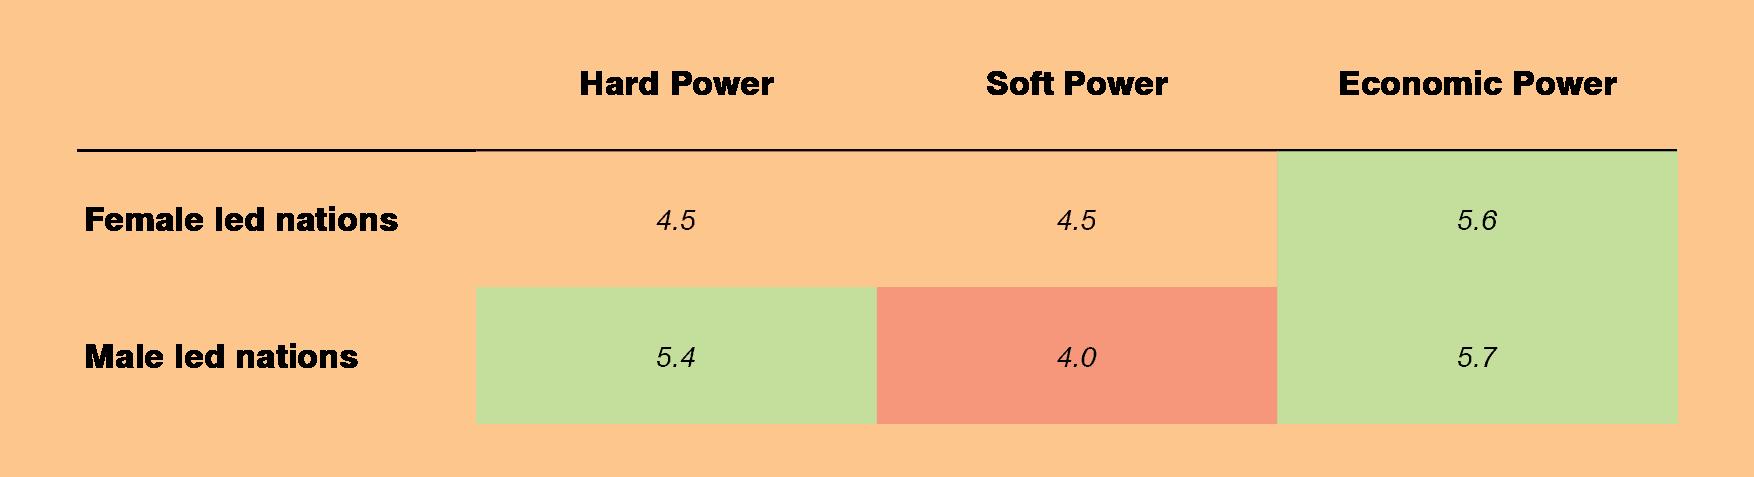 Figure 5. Hard, Economic, and Soft Power